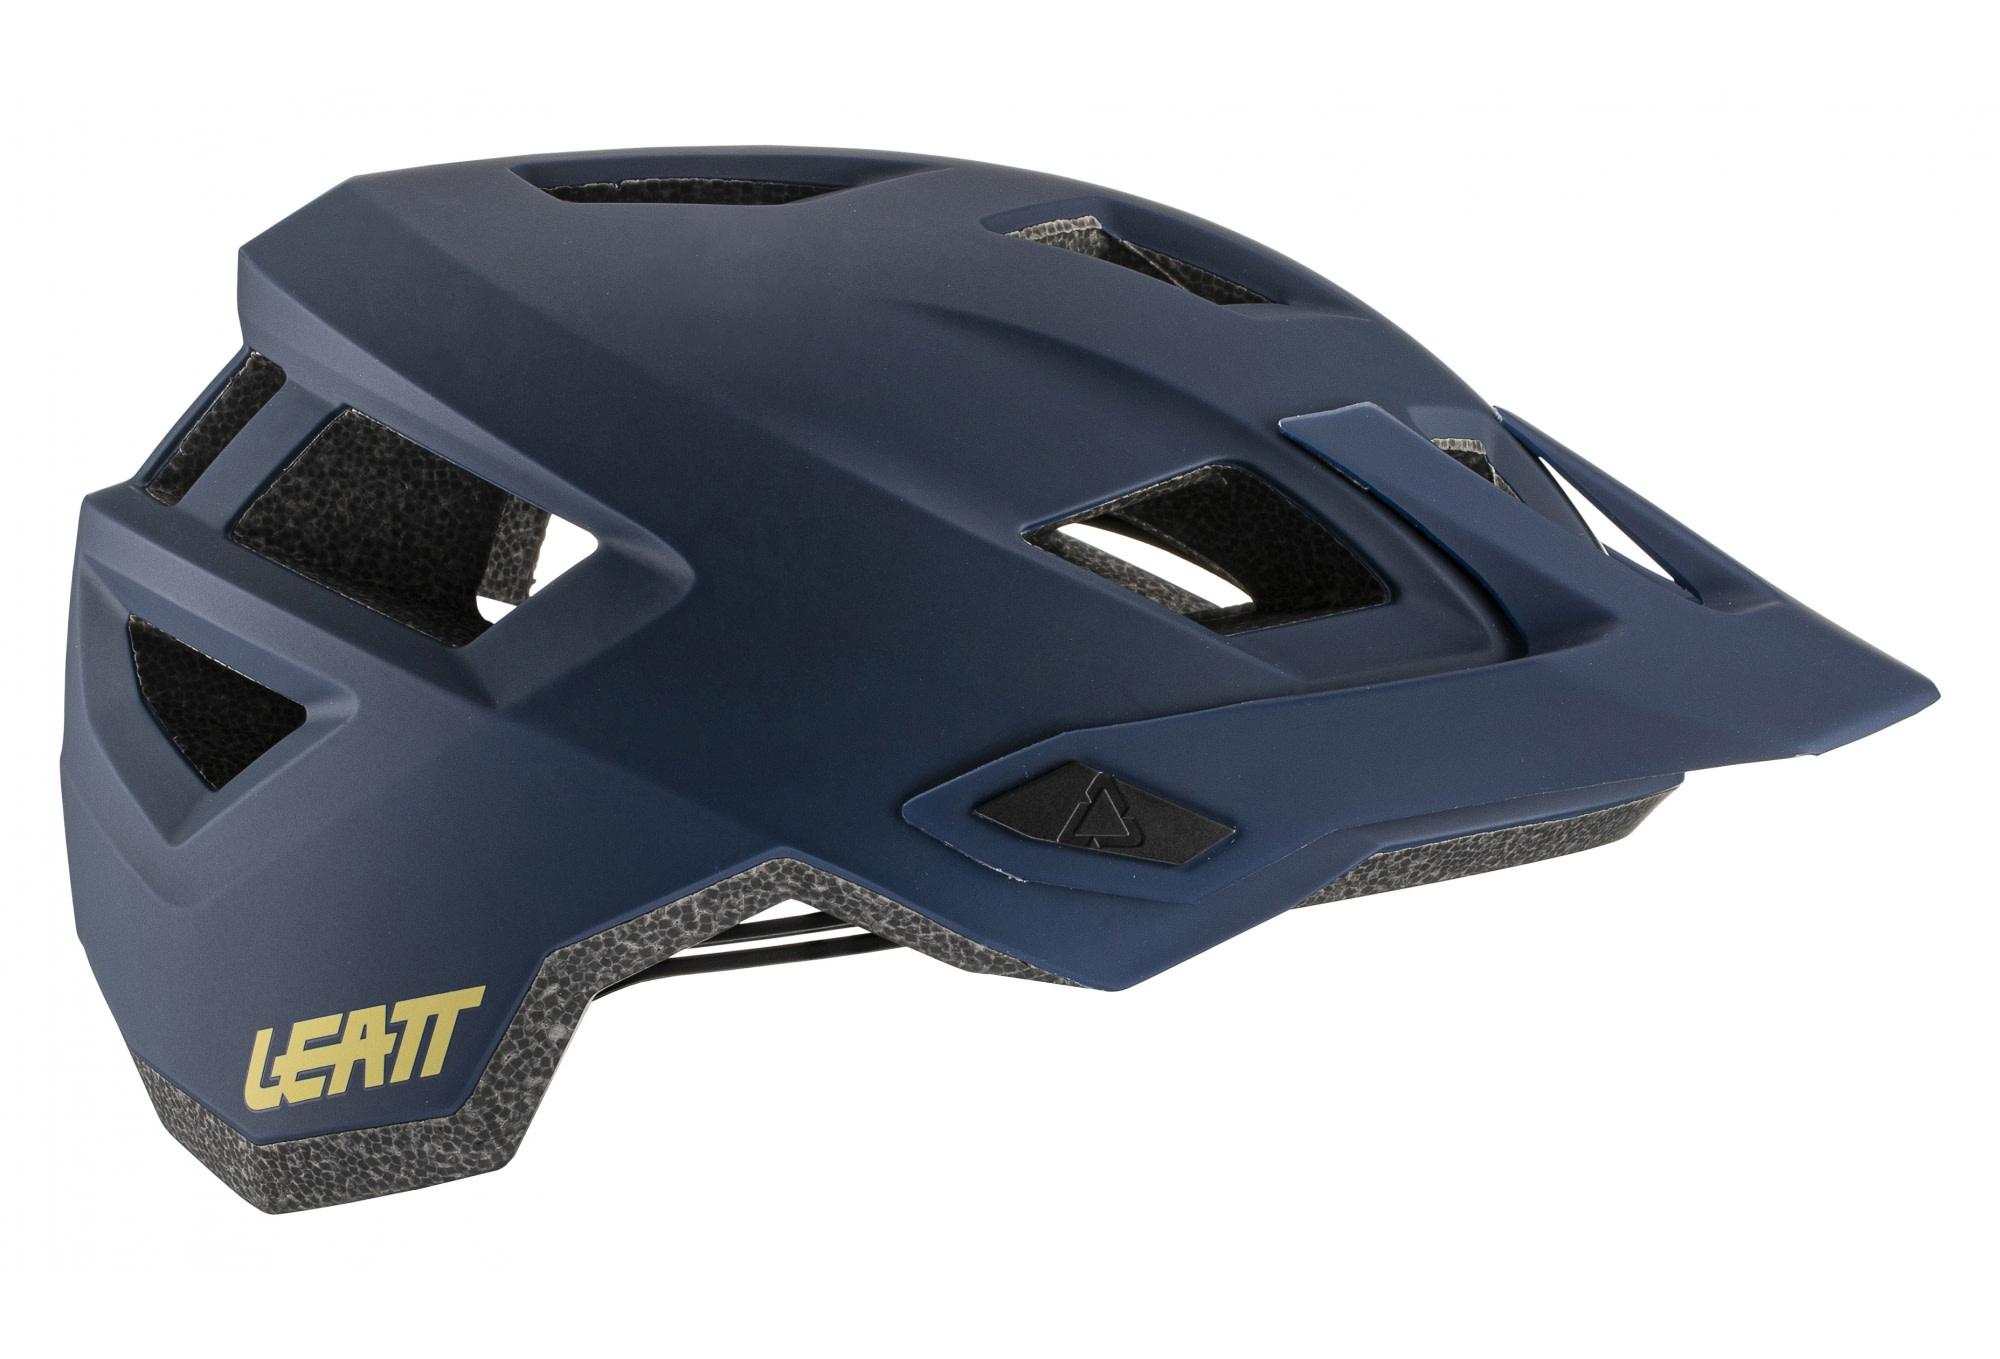 Leatt Leatt, MTB 1.0 Mtn, Helmet, Onyx, M, 55 - 59cm